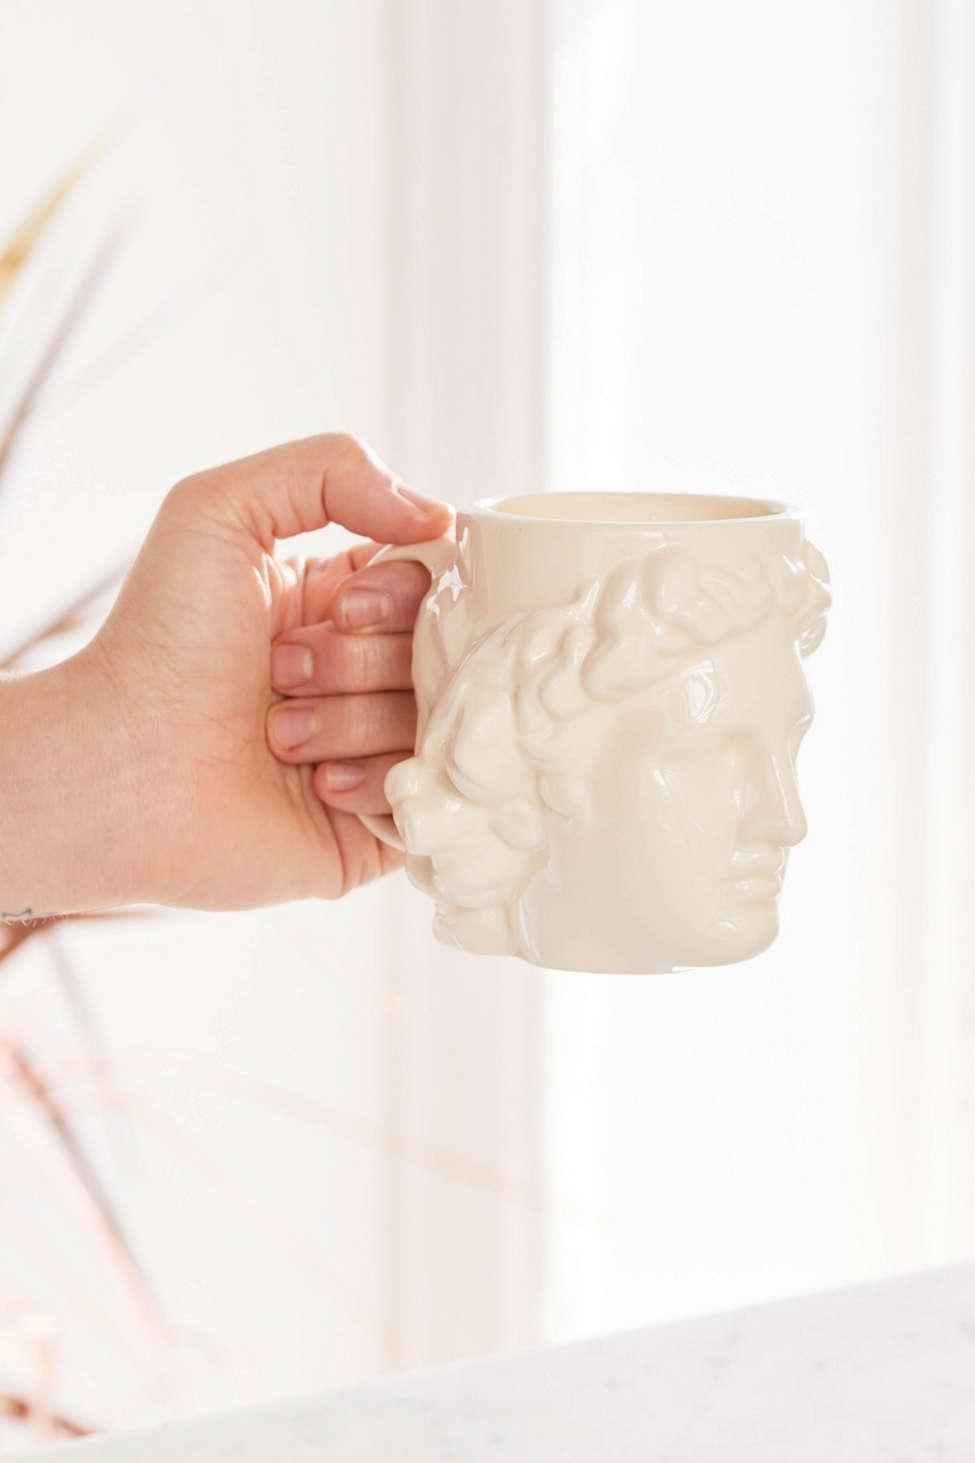 Slide View: 3: DOIY Design Hestia Shaped Mug